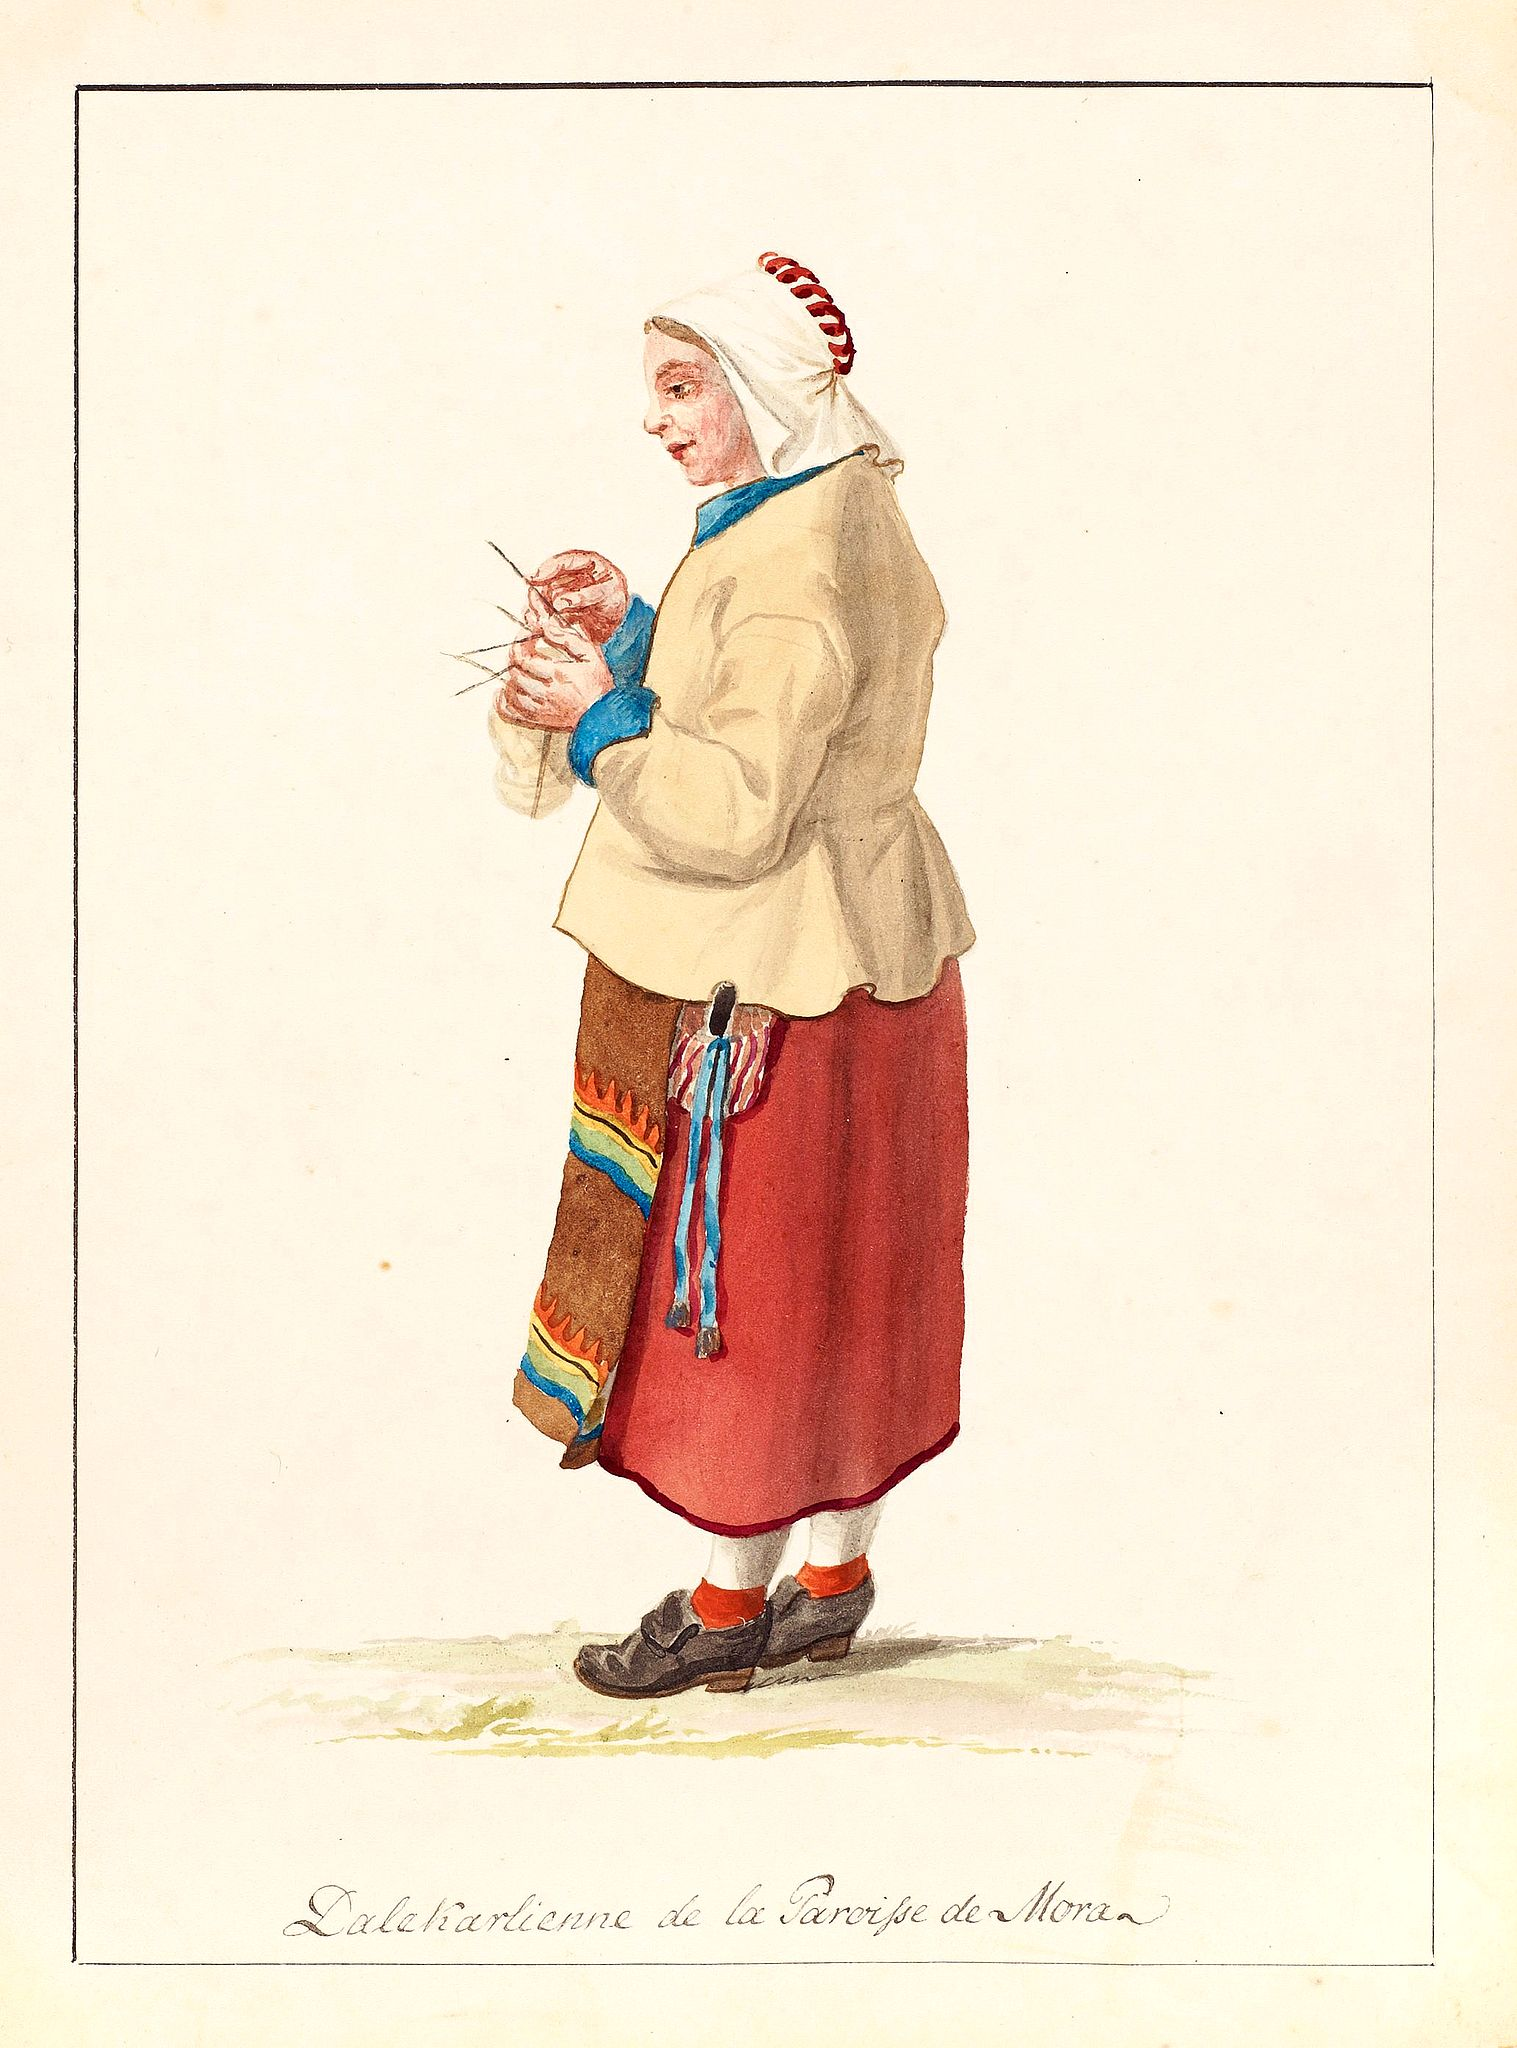 SWEDMAN, C.W. attributed to -  Dalekarlienne de la Paroisse de Mora.